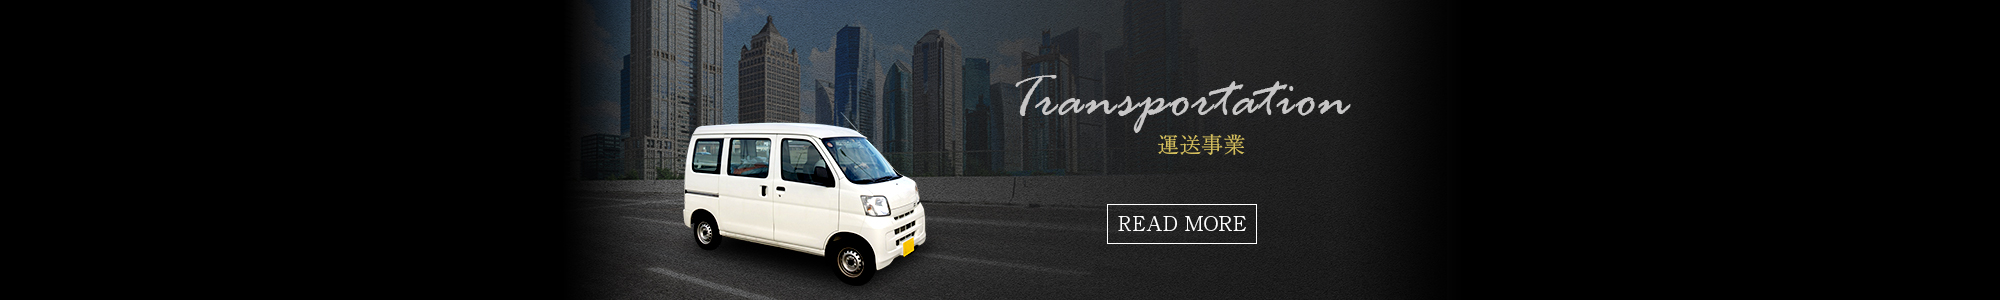 Transportation_banner